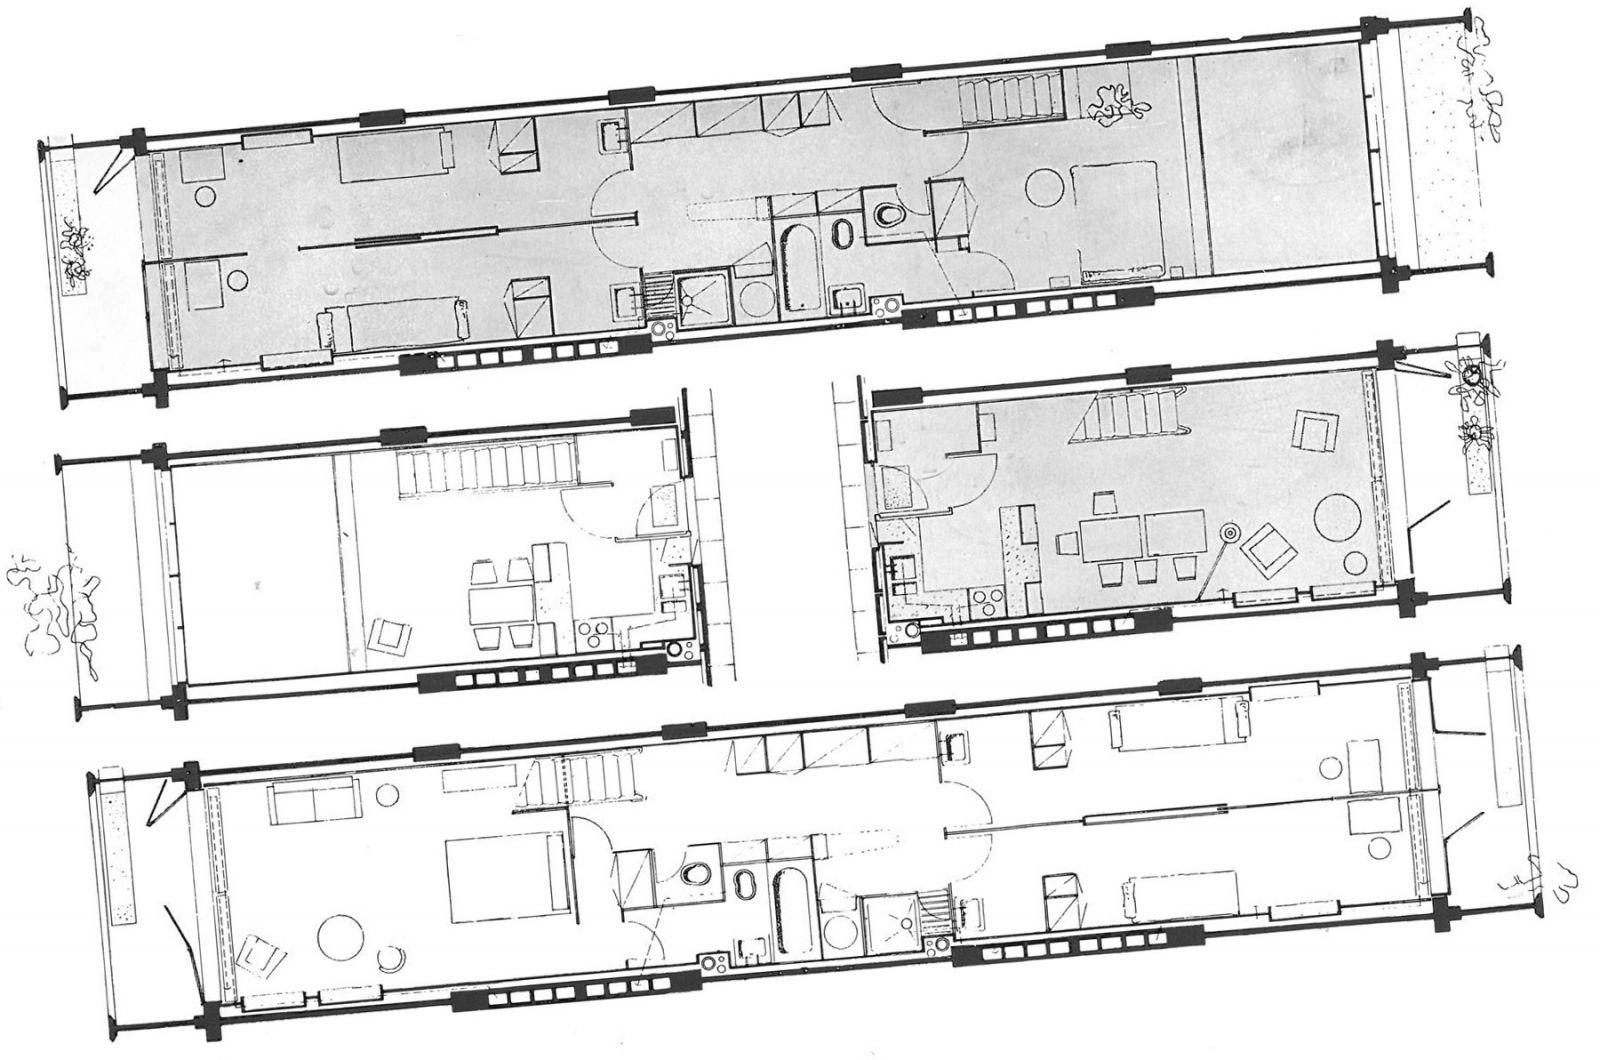 Le Corbusier Unite D Habitation floor plans of living units in unite d'habitation, marseille